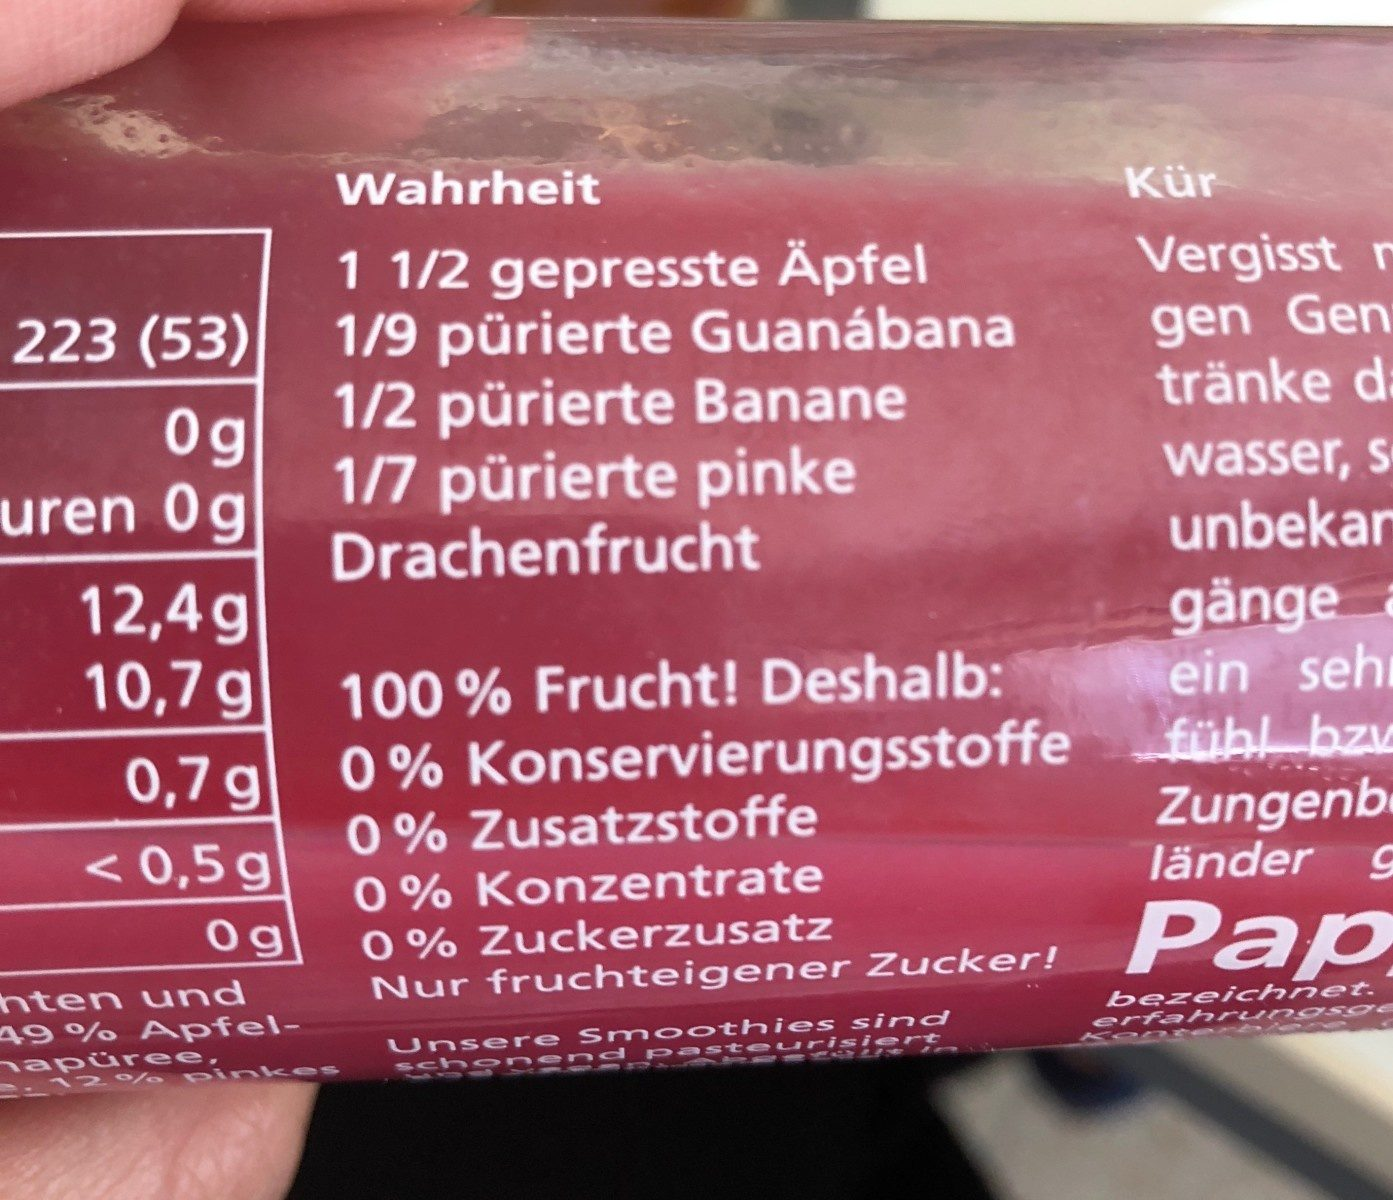 True Fruits, Pink Smoothie - Ingredients - fr